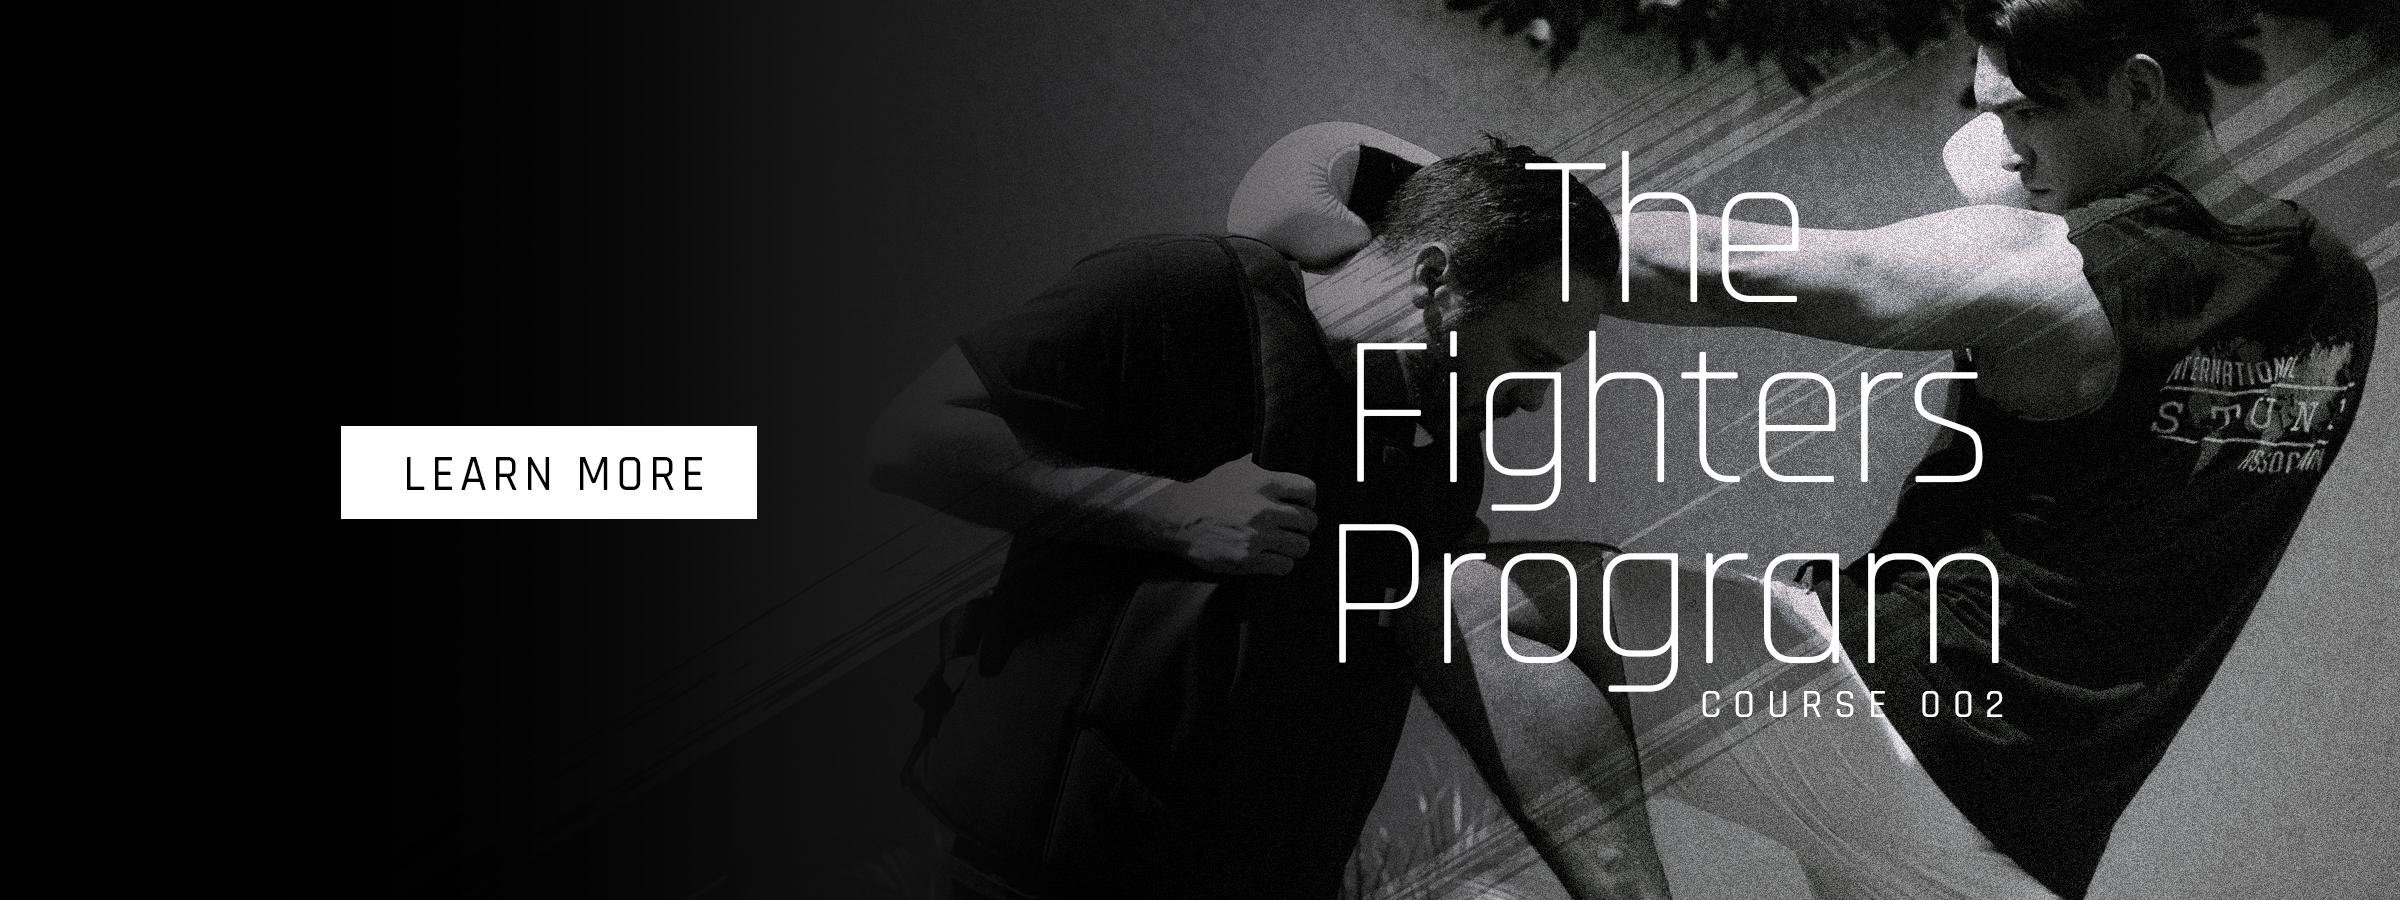 The Fighters Program with Osu Gym, Noah Fleder and Jon Alegria